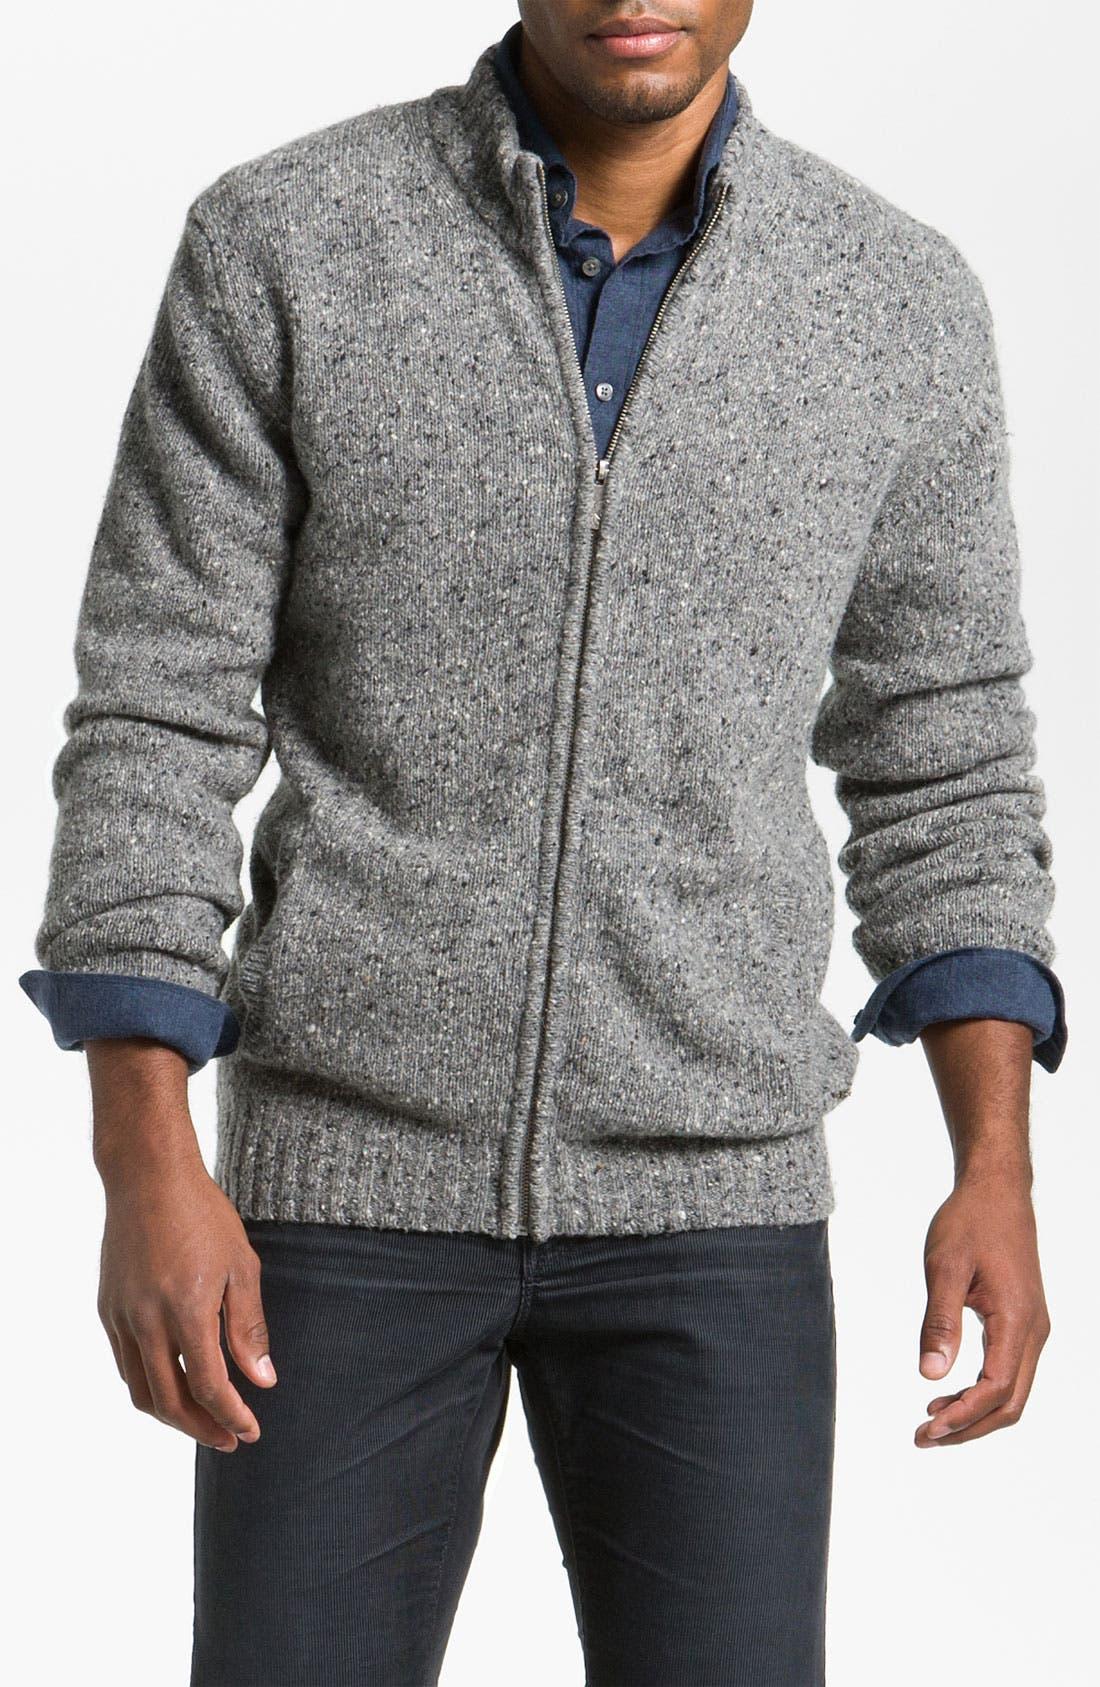 Alternate Image 1 Selected - Hickey Freeman 'Donegal' Wool Blend Zip Cardigan